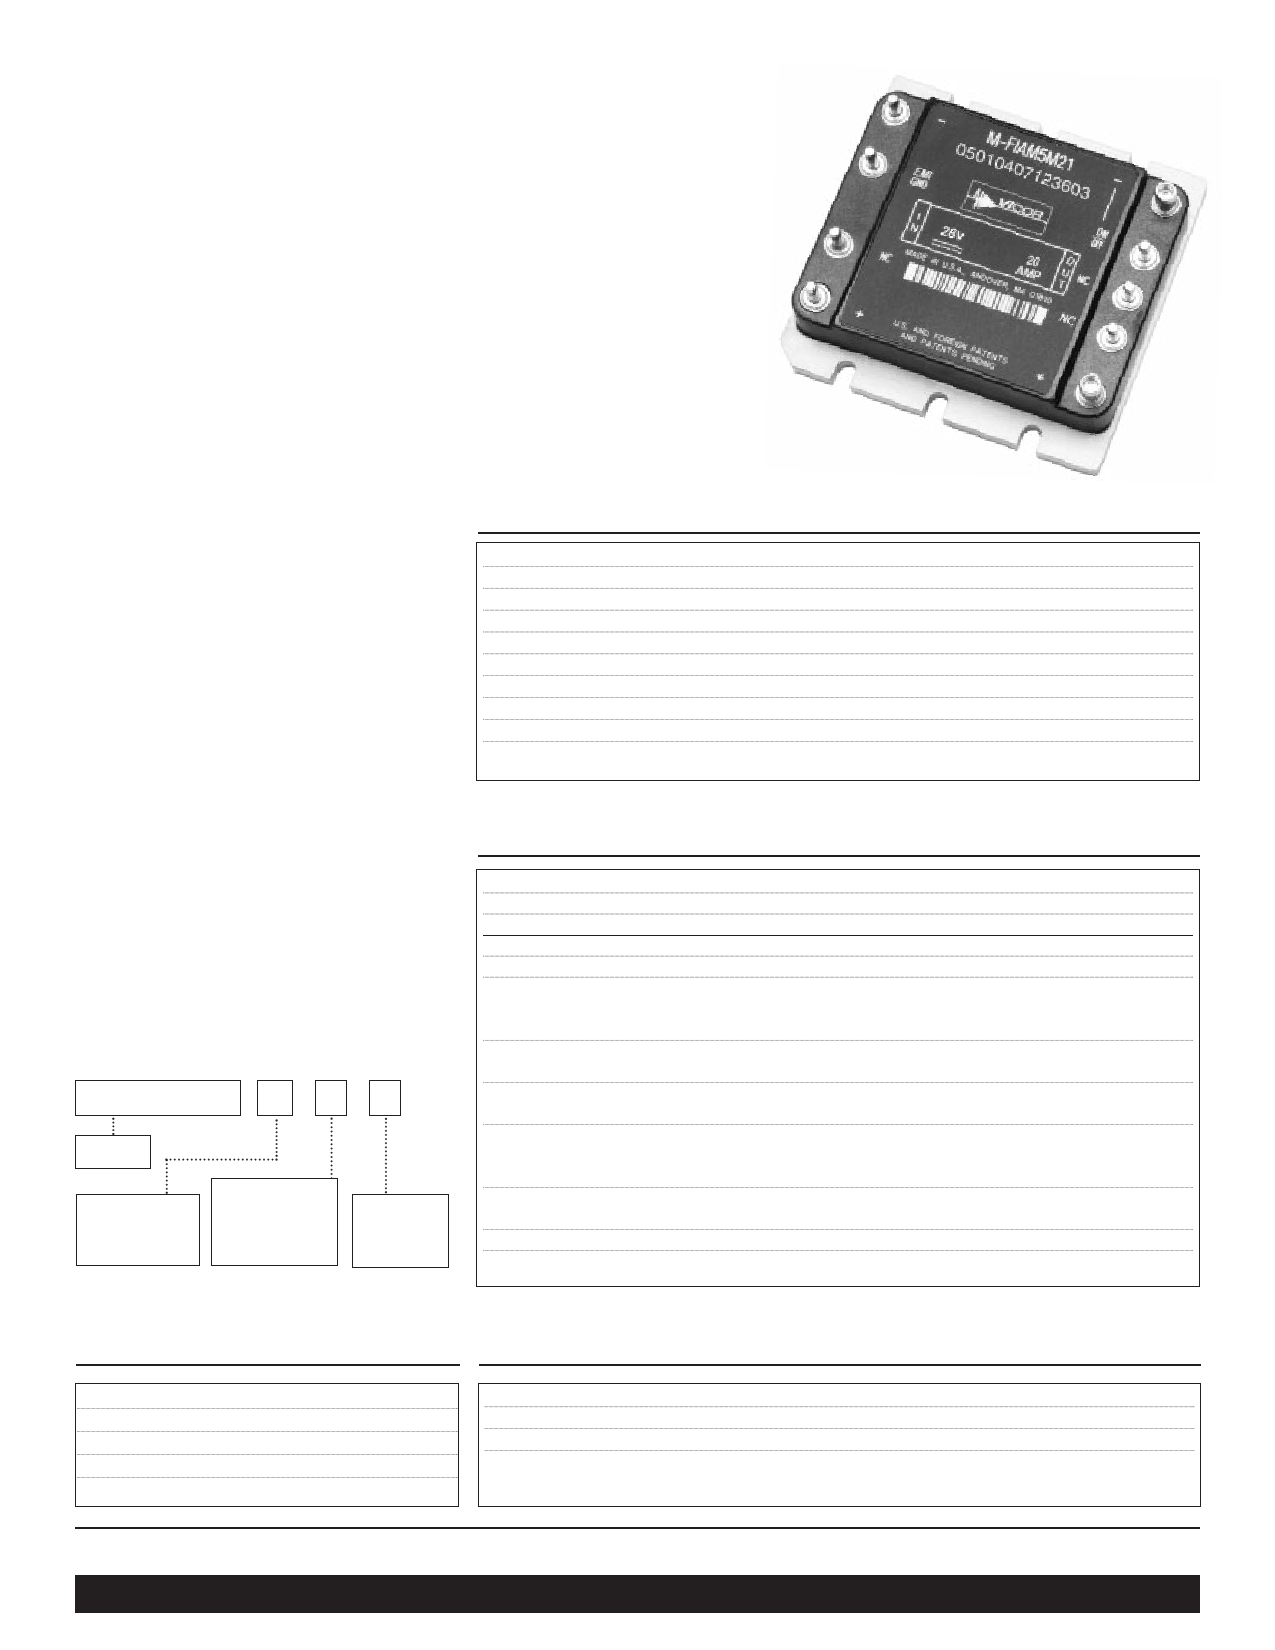 M-FIAM5HS1 datasheet